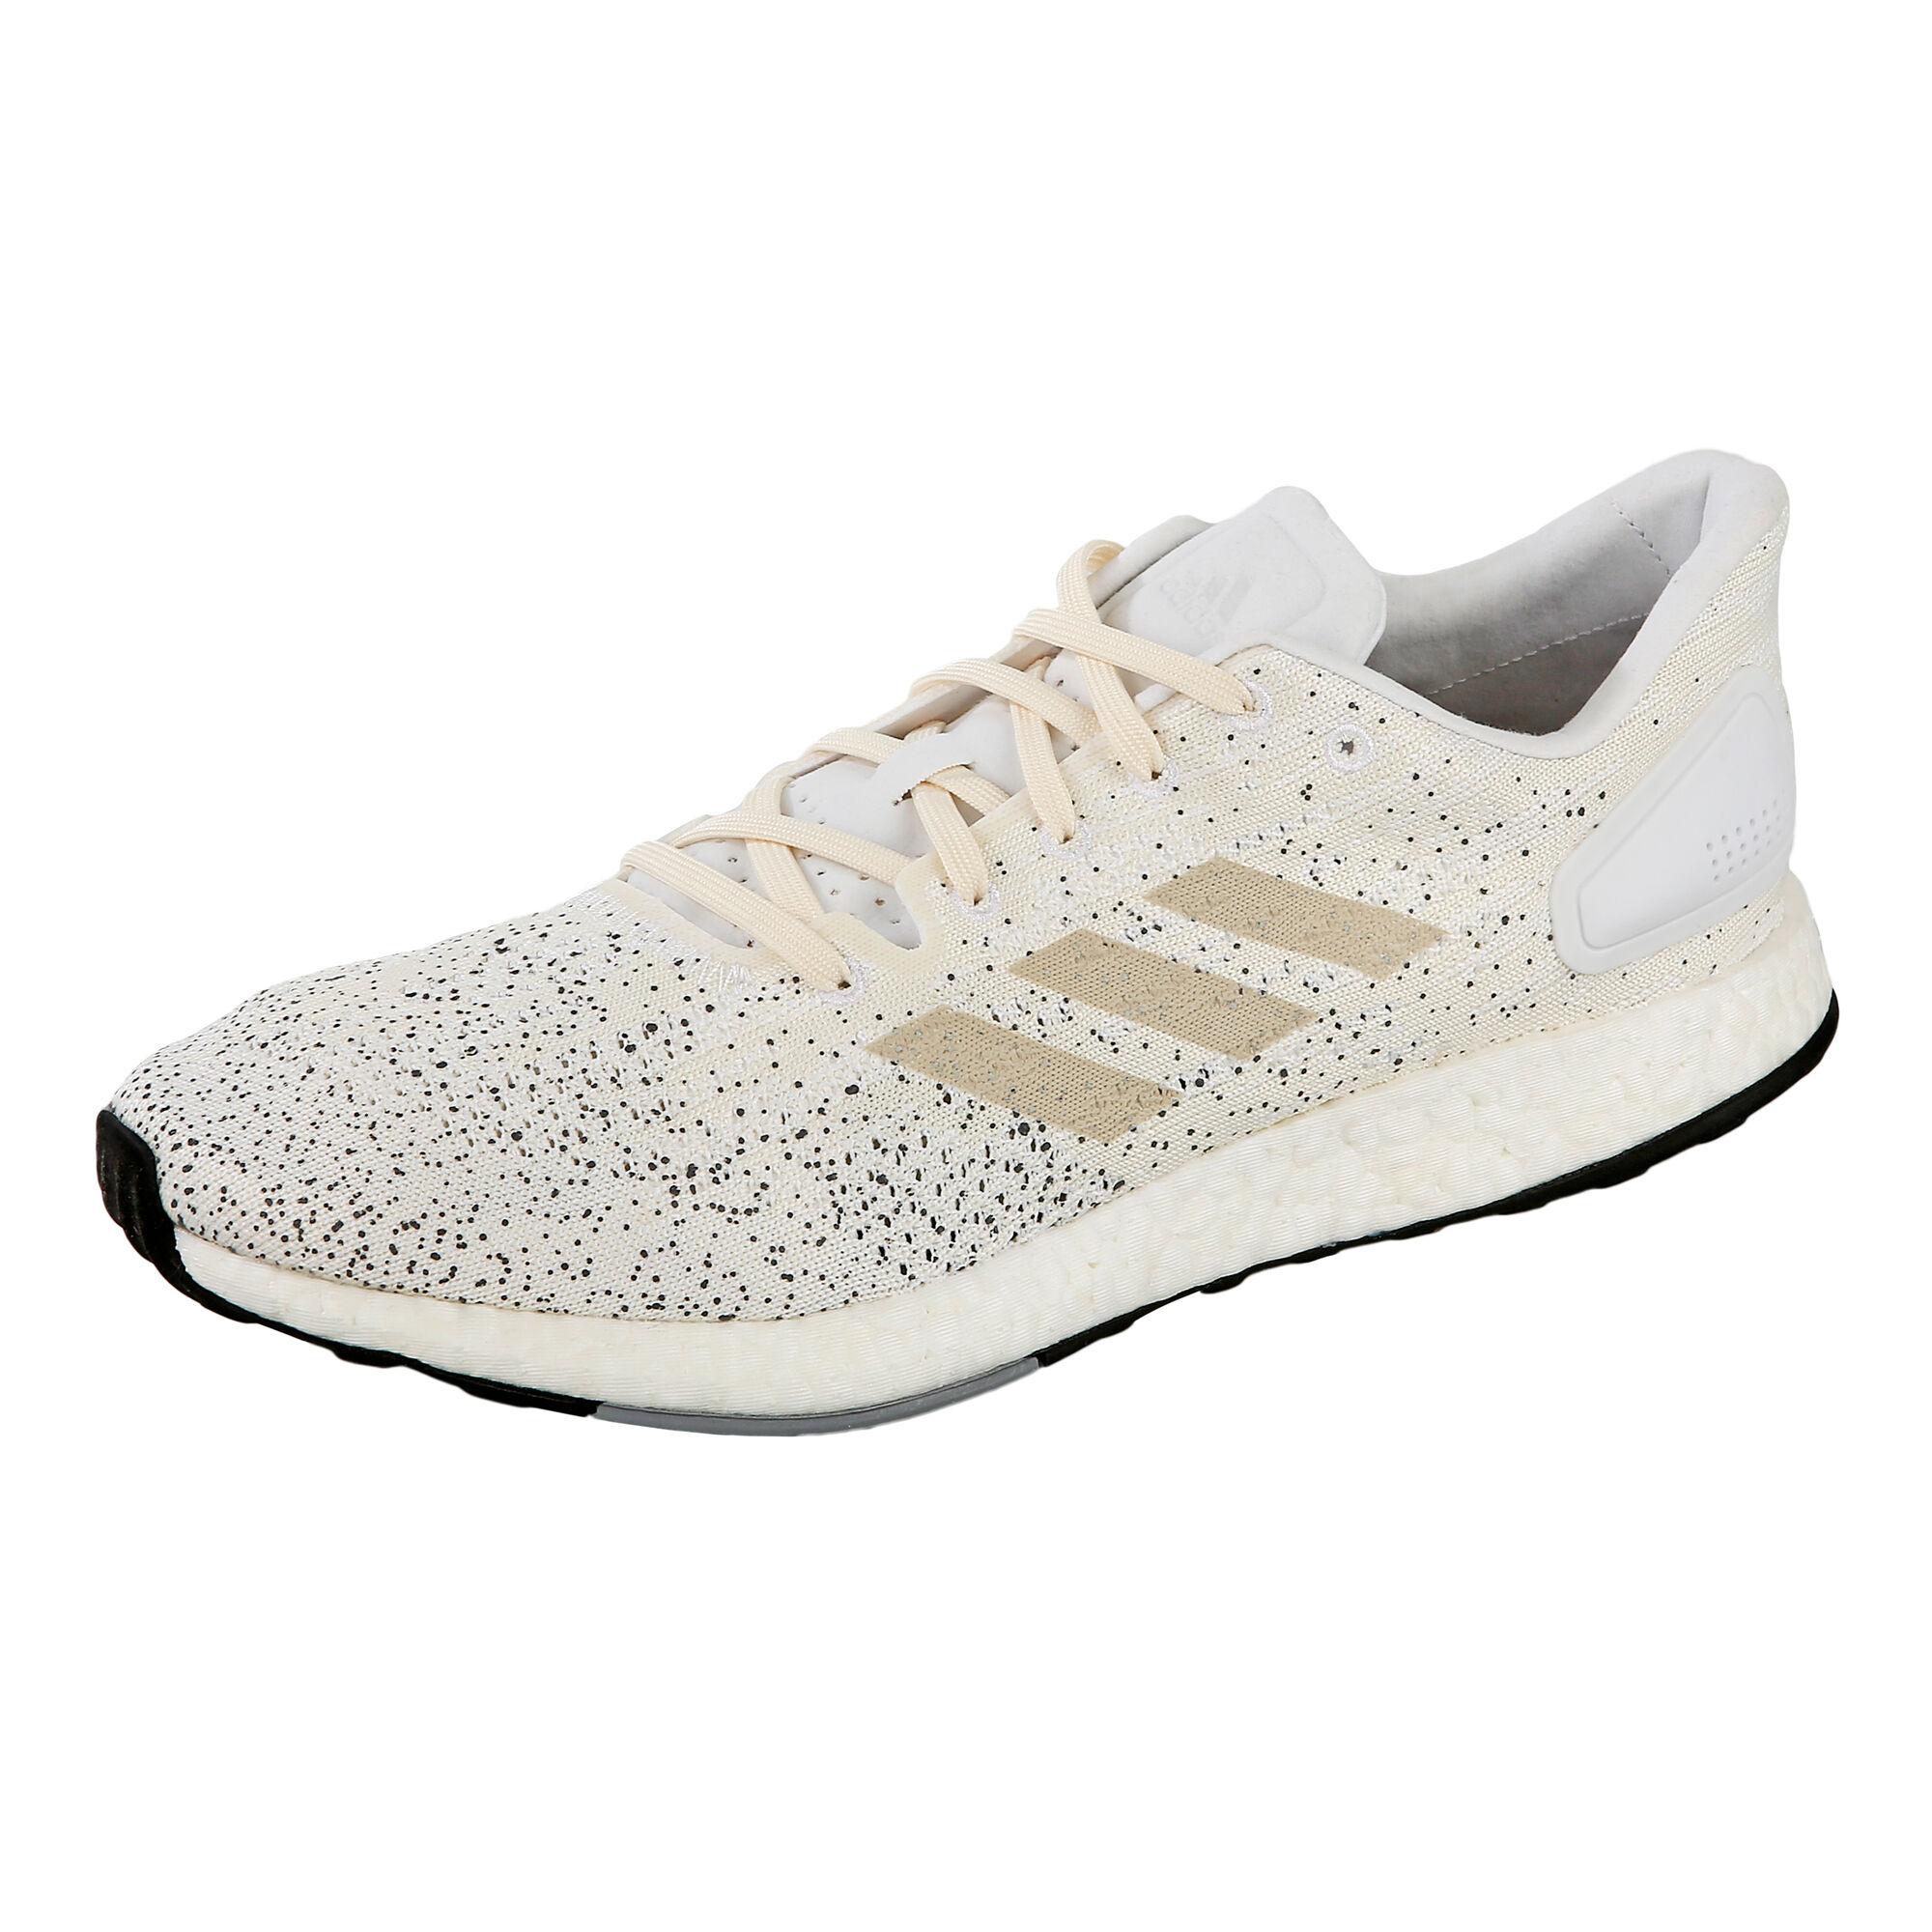 b332e8209ef62 buy adidas Pure Boost DPR Neutral Running Shoe Men - Cream